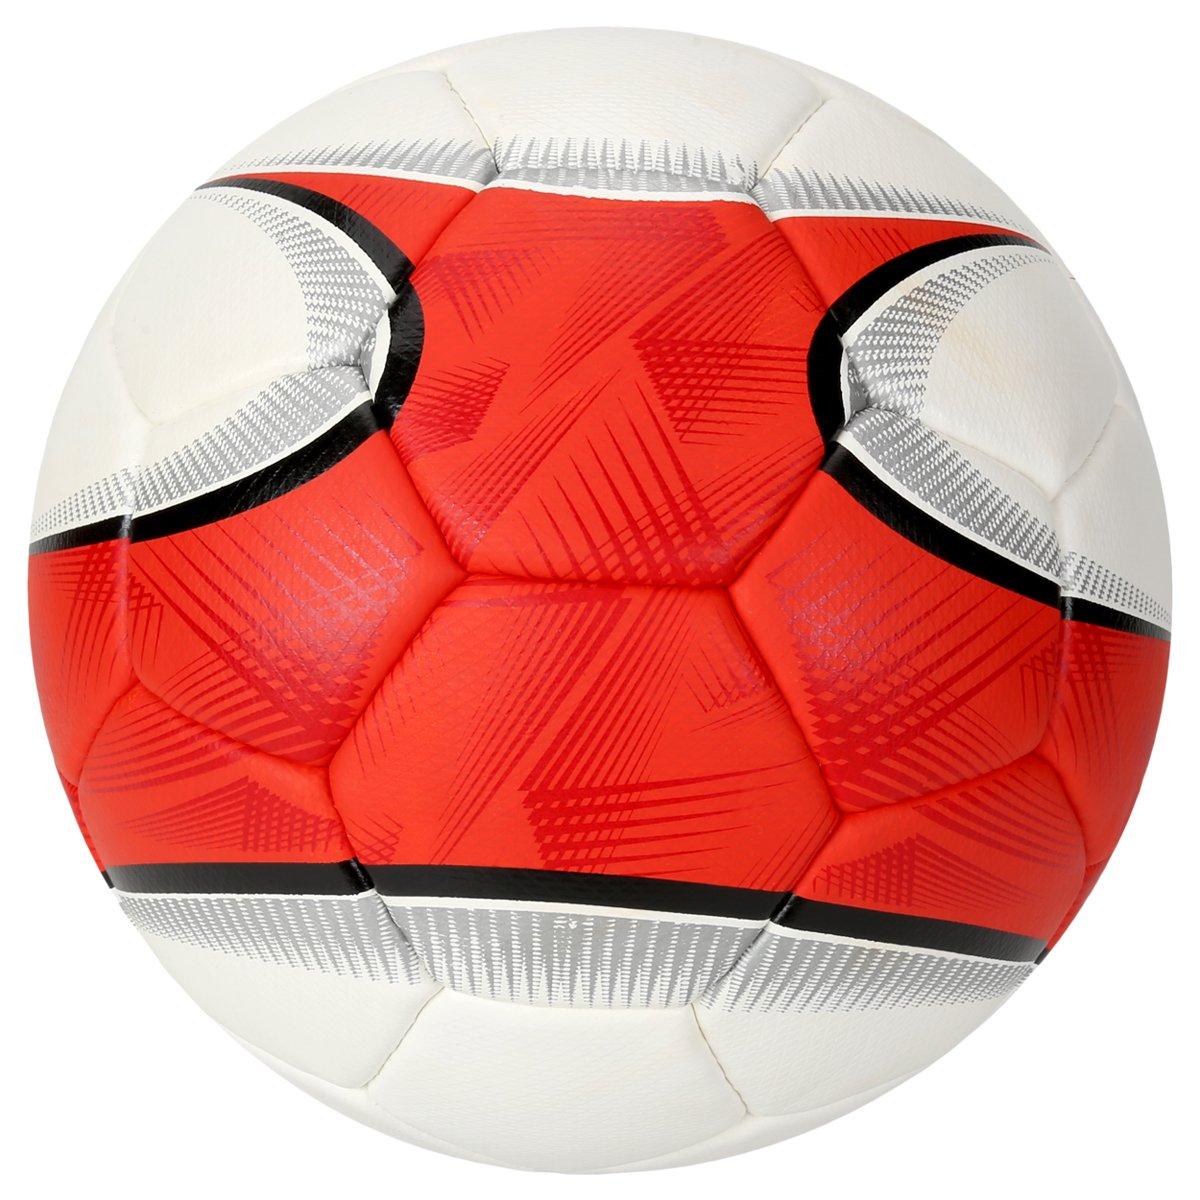 Bola Futebol Penalty Matis 500 5 Futsal - Compre Agora  f1bfd76818823